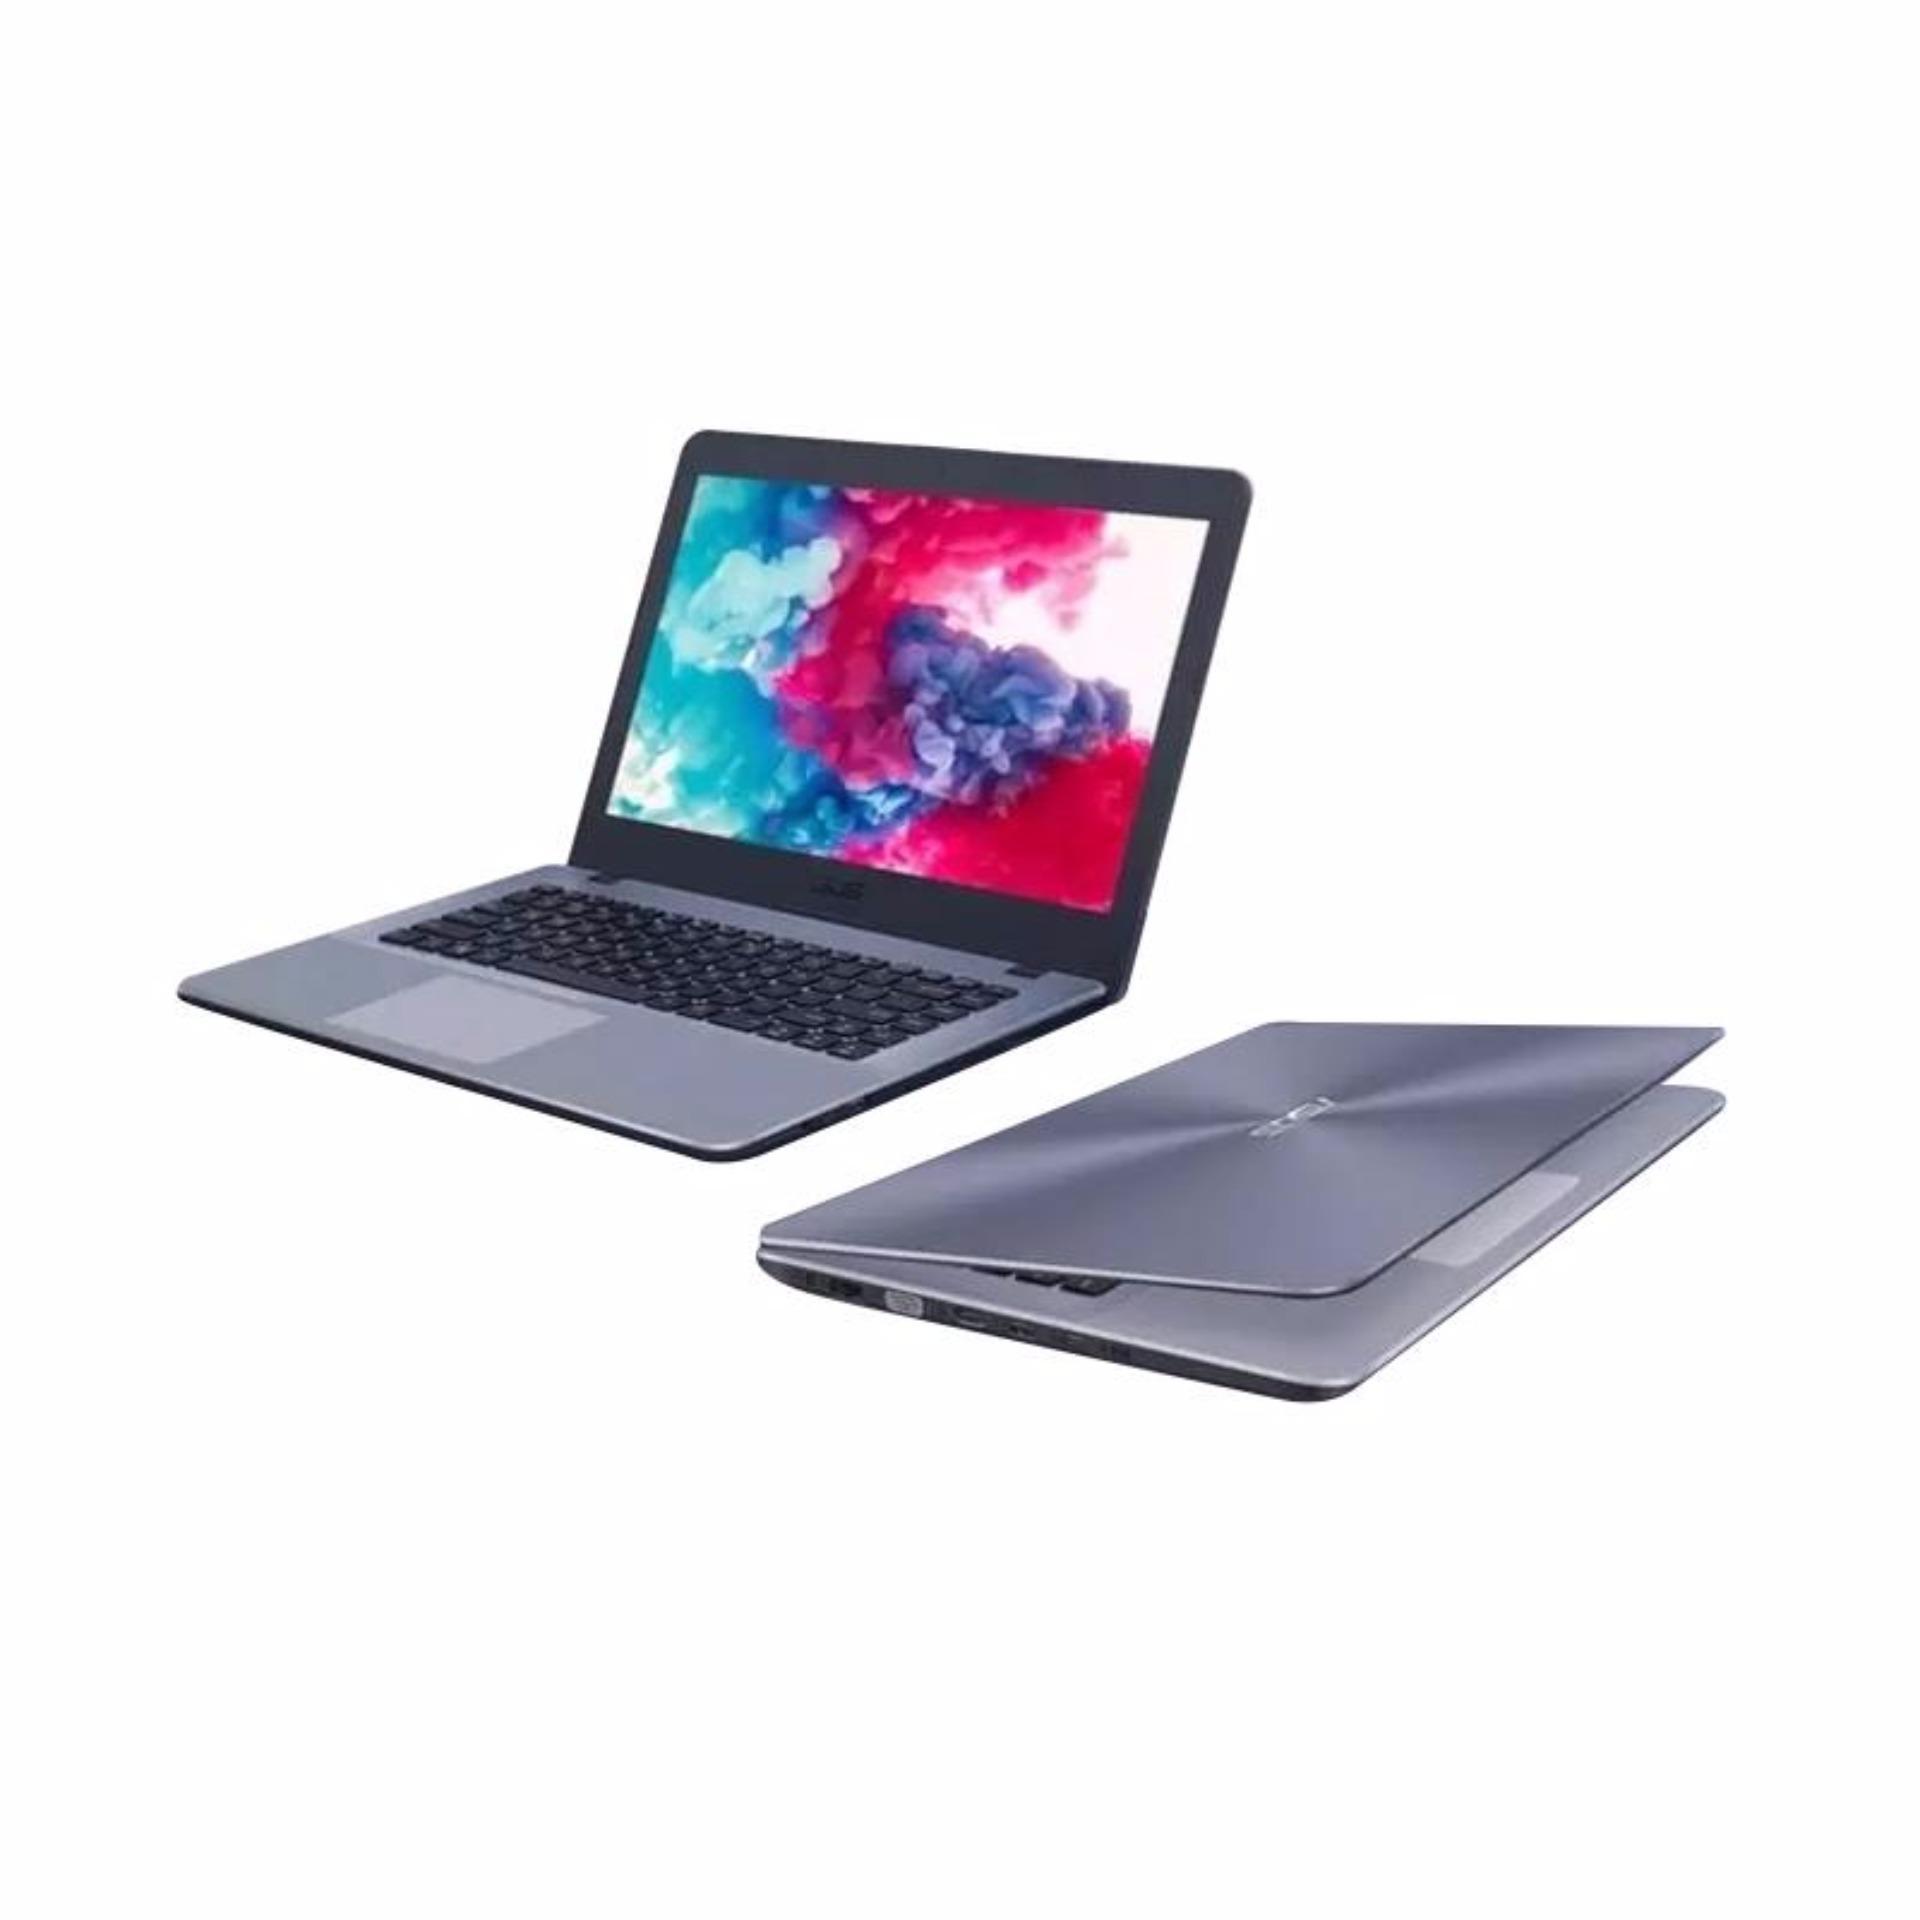 Asus Vivobook A442UQ FA047T Notebook 14